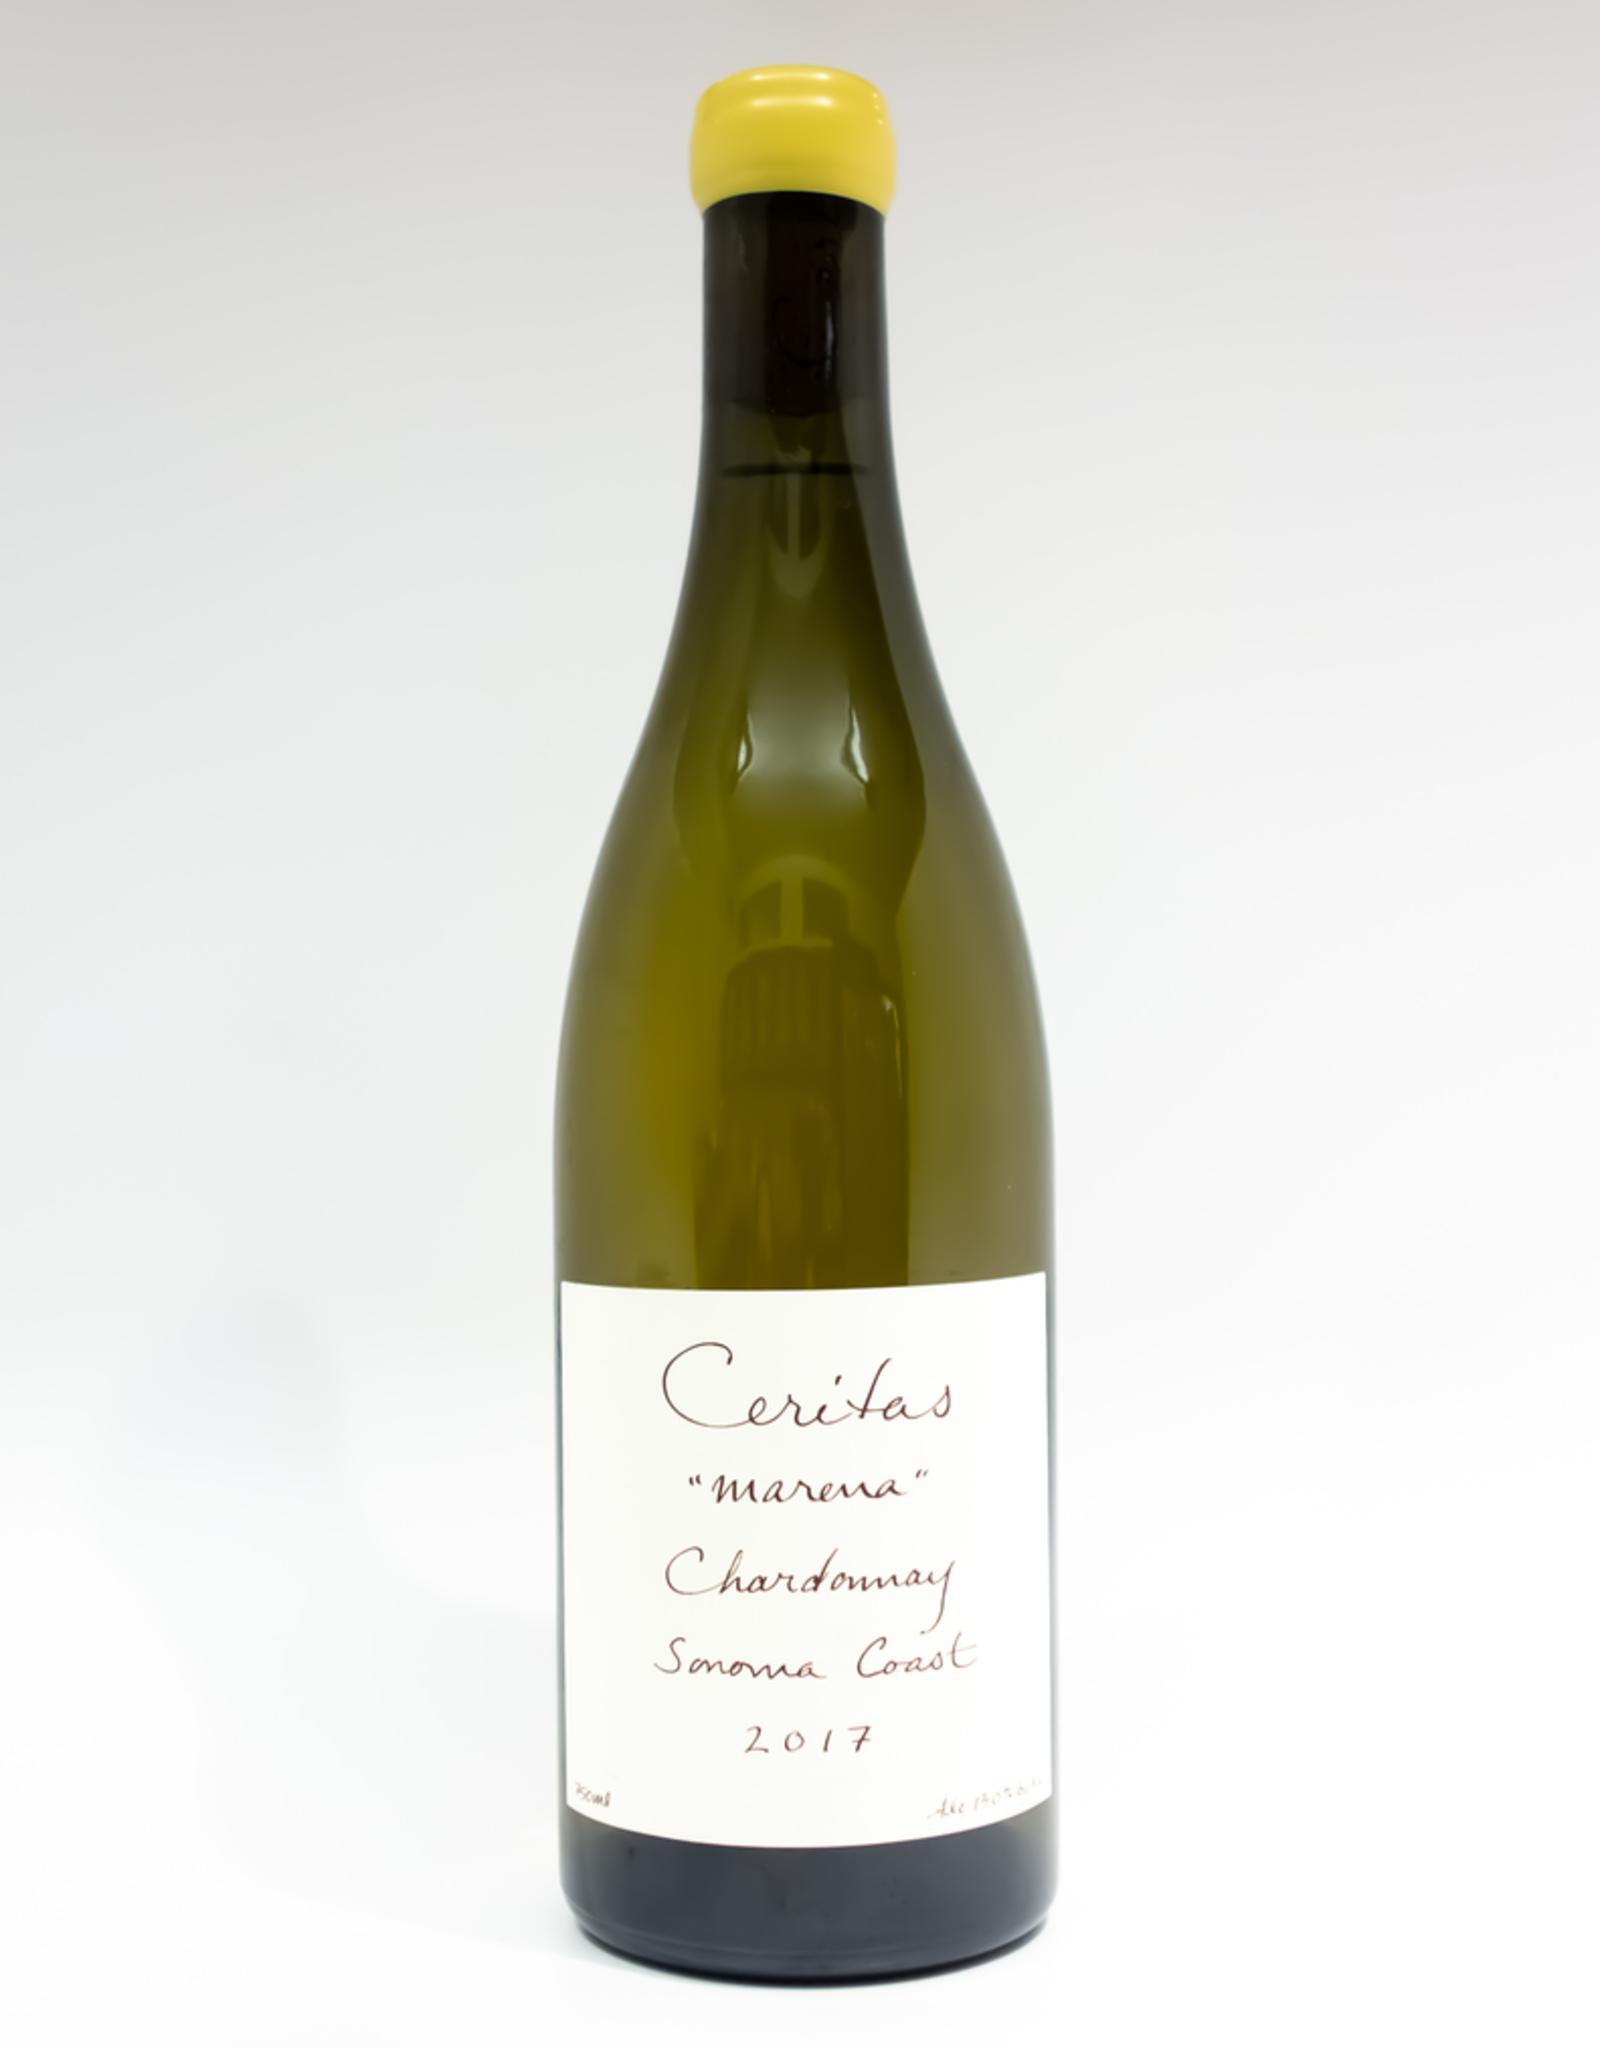 Wine-White-Round Ceritas Chardonnay 'Marena' Sonoma Coast 2017